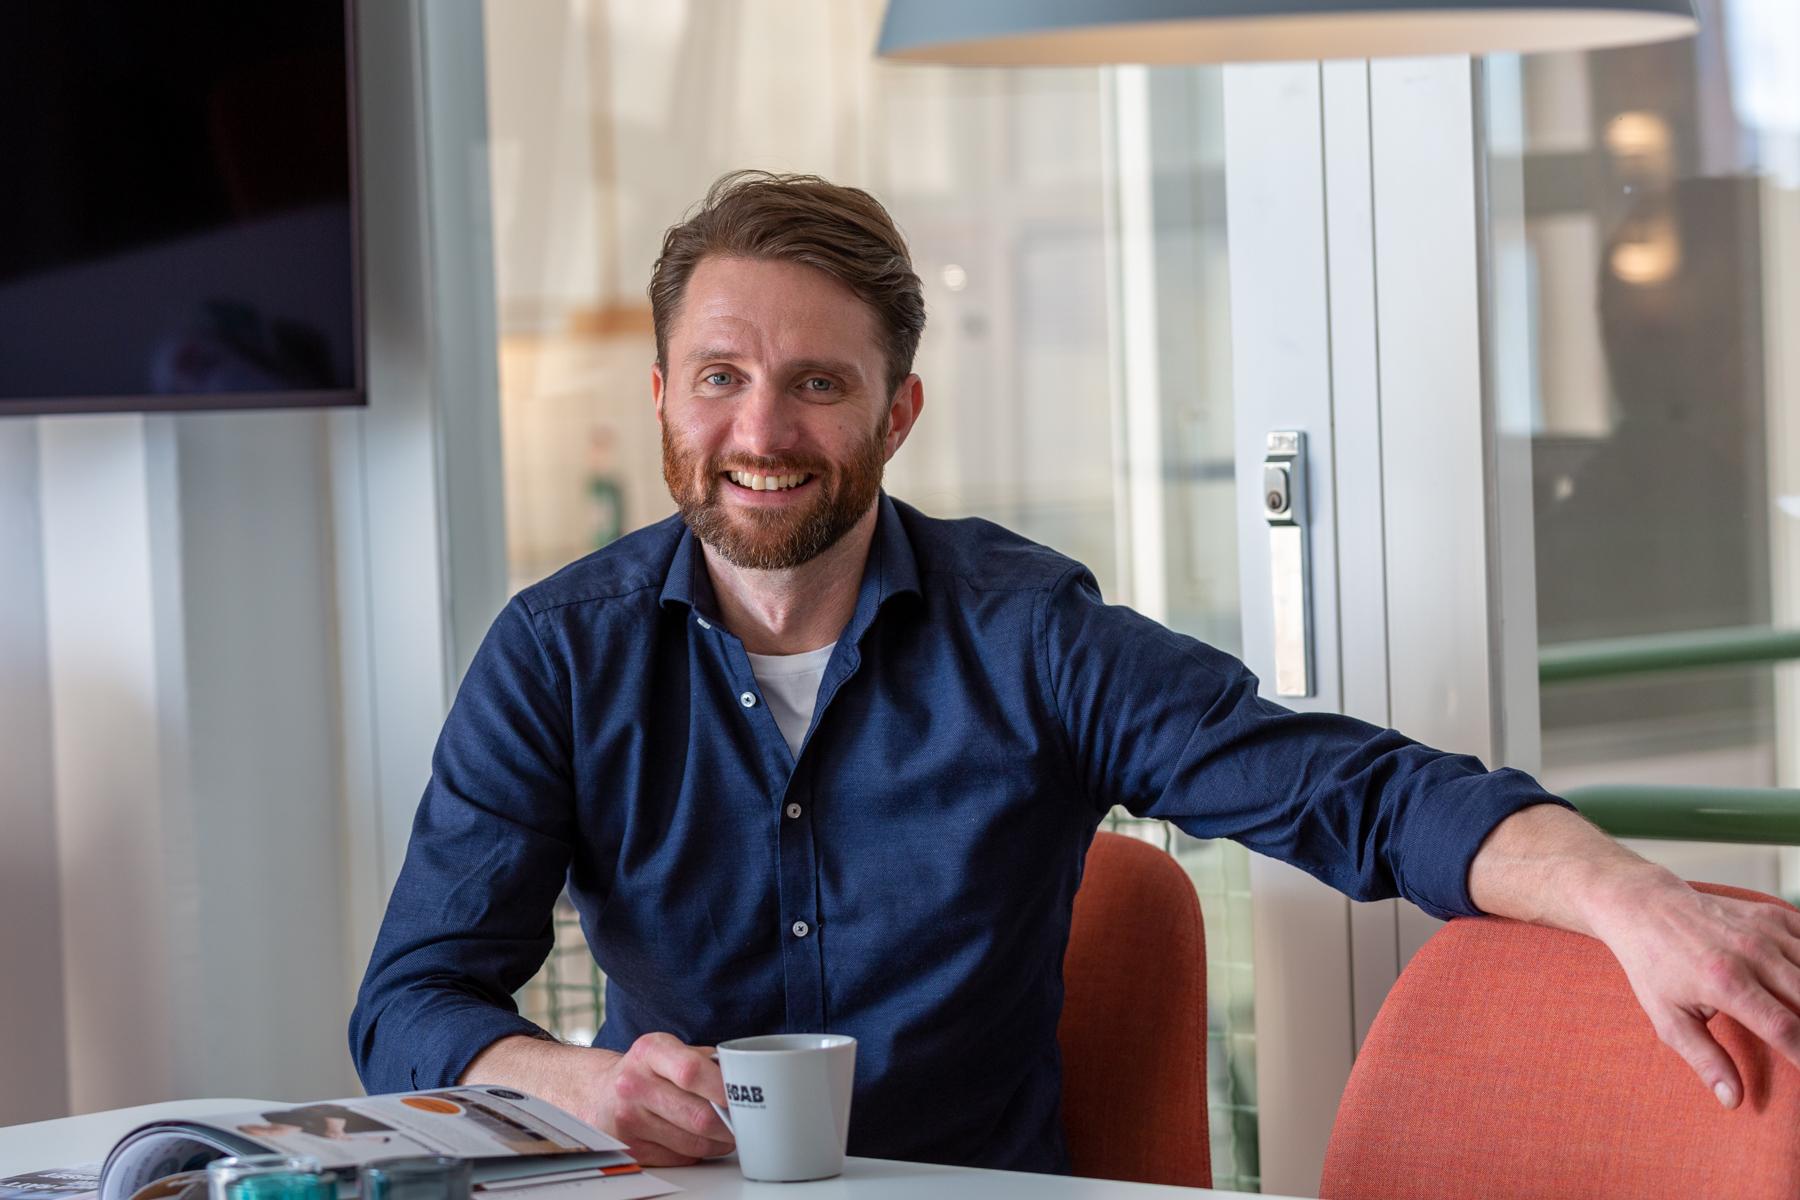 Fredrik Olsson sitter med en kaffemugg i lunchrummet och ler mot kameran.